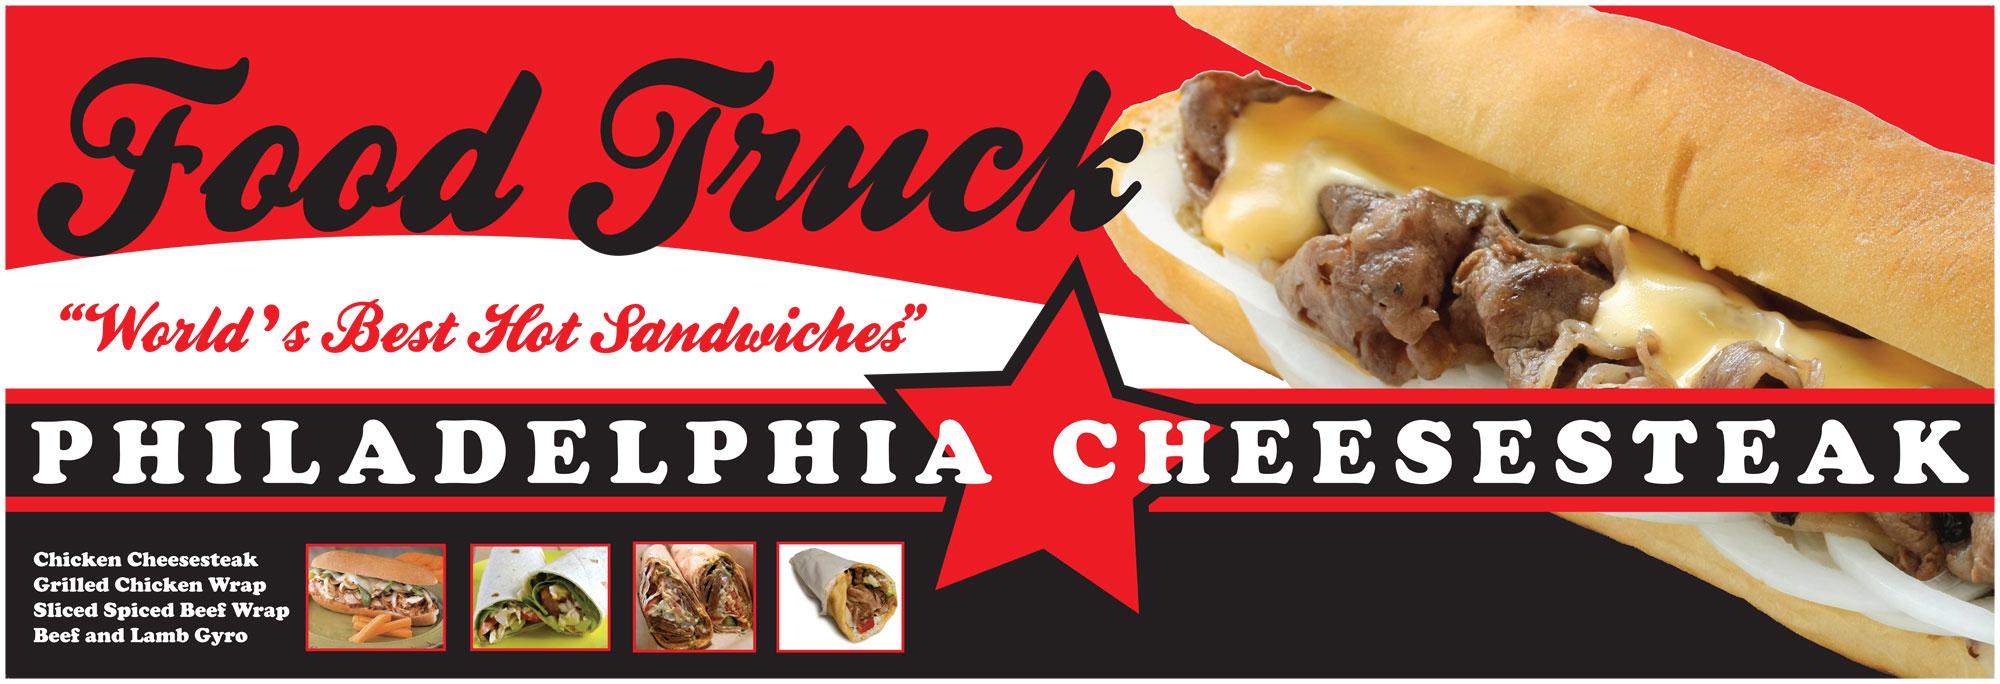 New Banner Design for Kansas City Food Truck | Pilcher Creative Agency